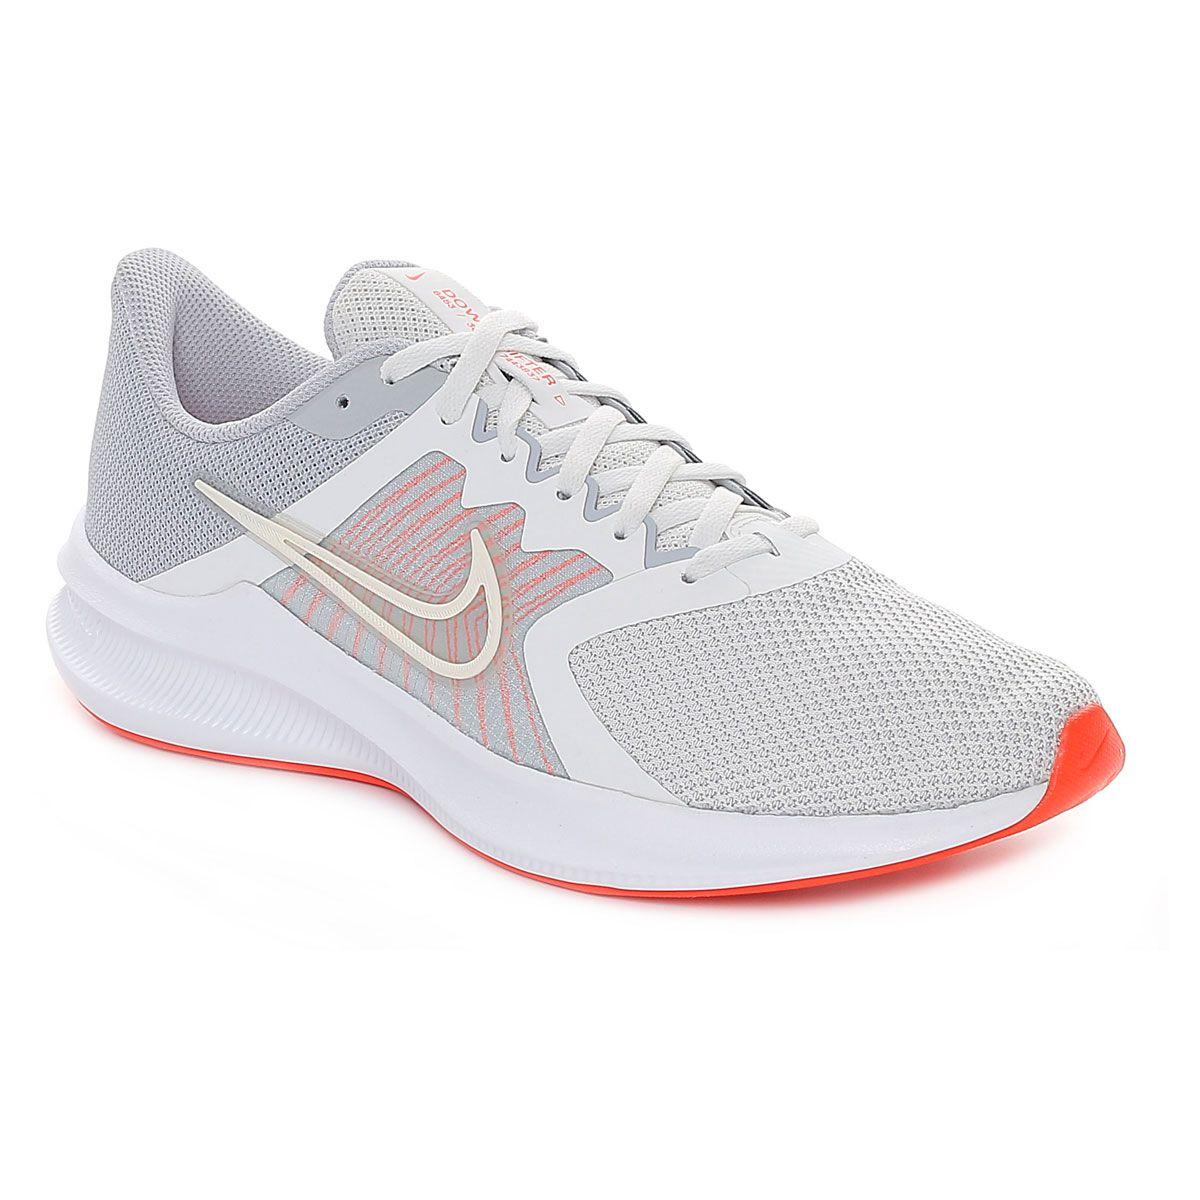 Nike Downshifter 11 Uomo Grigio Rosso